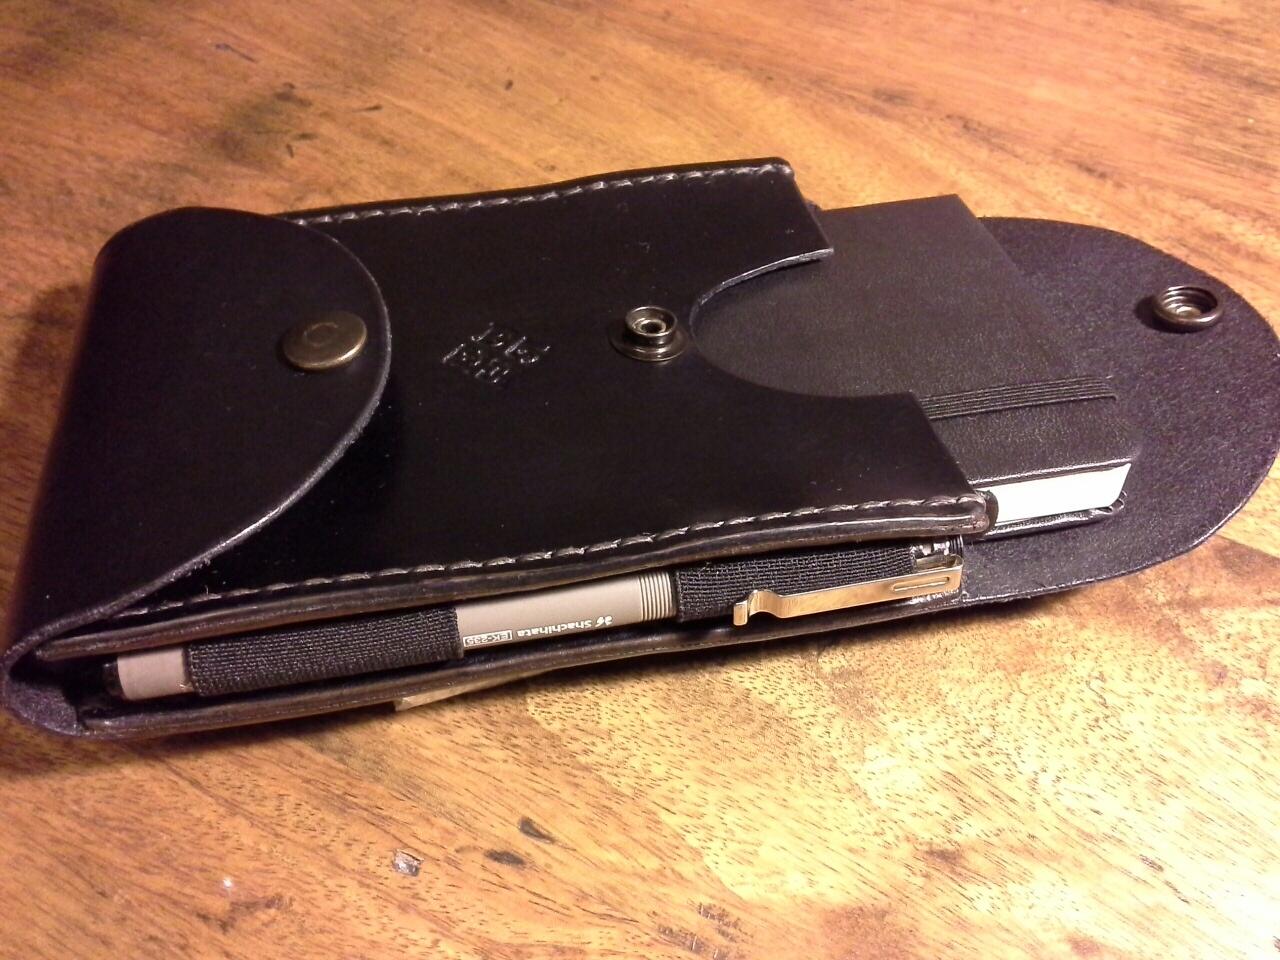 How to make a leather belt case for a pocket Moleskine notebook - with penholder - or other similar stuff..